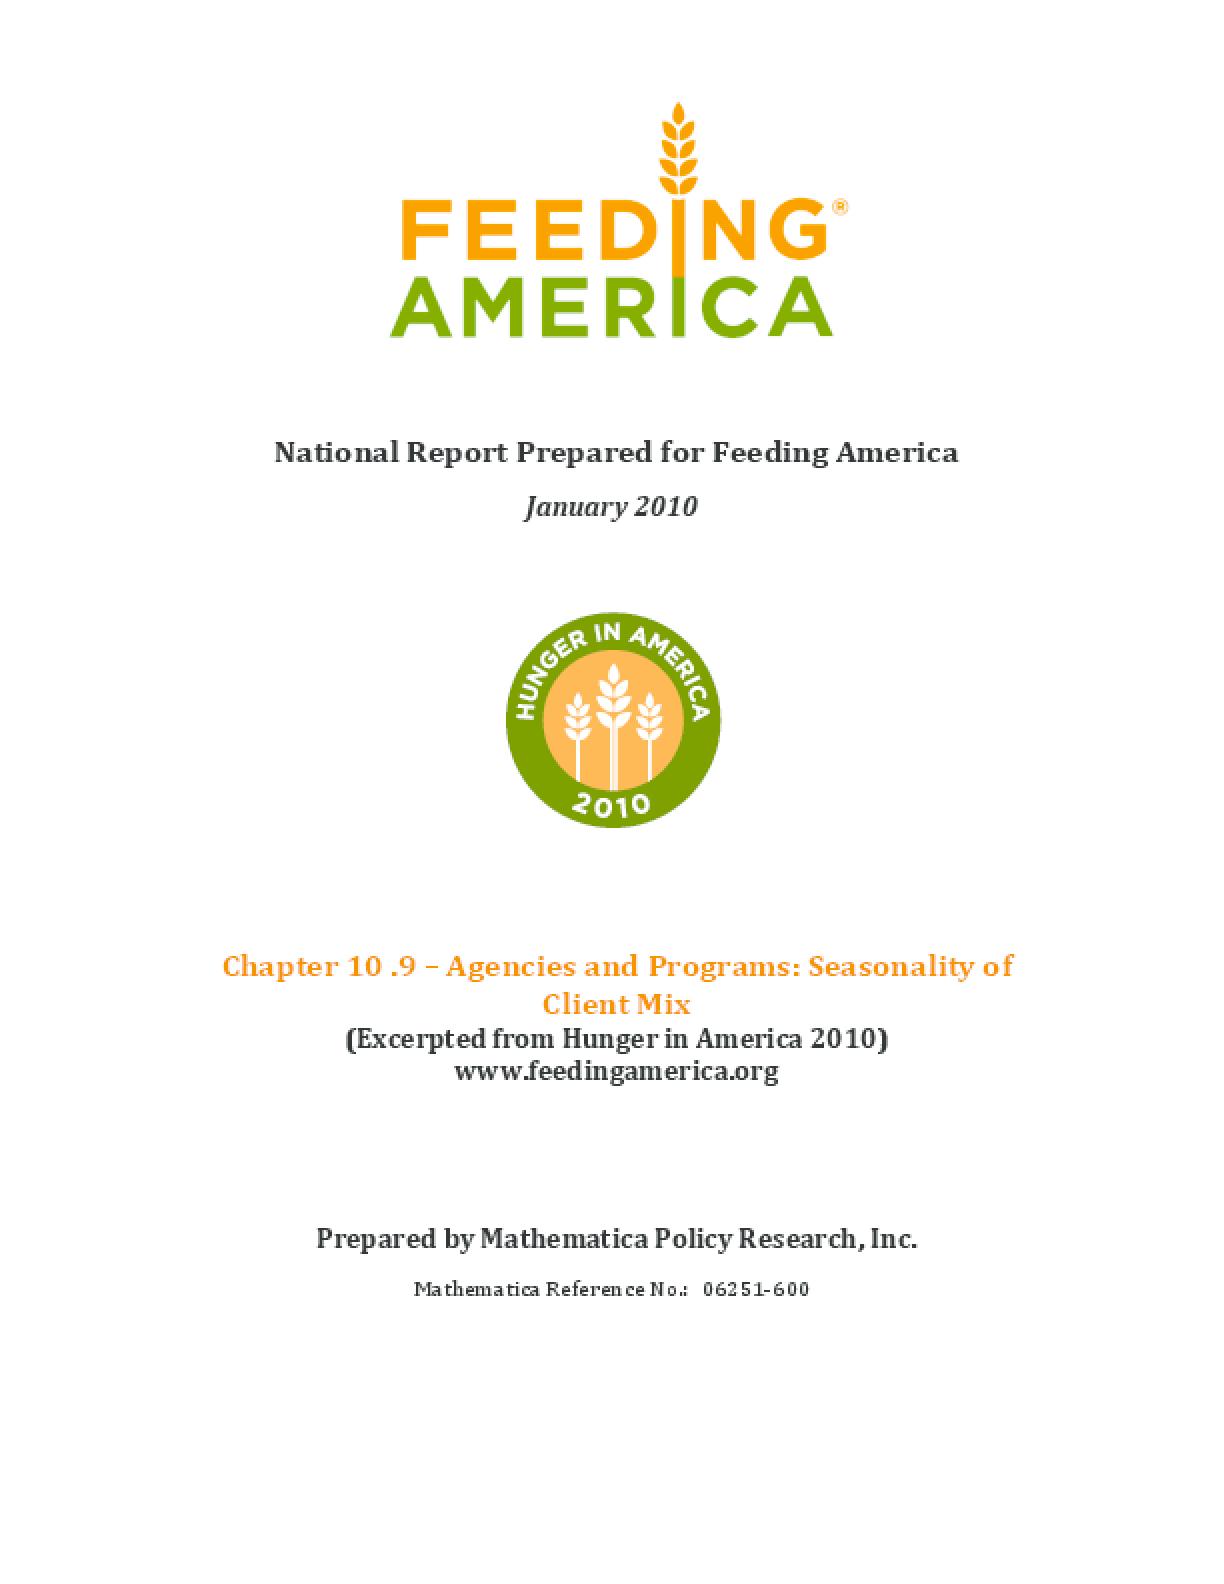 Feeding America Agencies and Food Programs: Seasonality of Client Mix